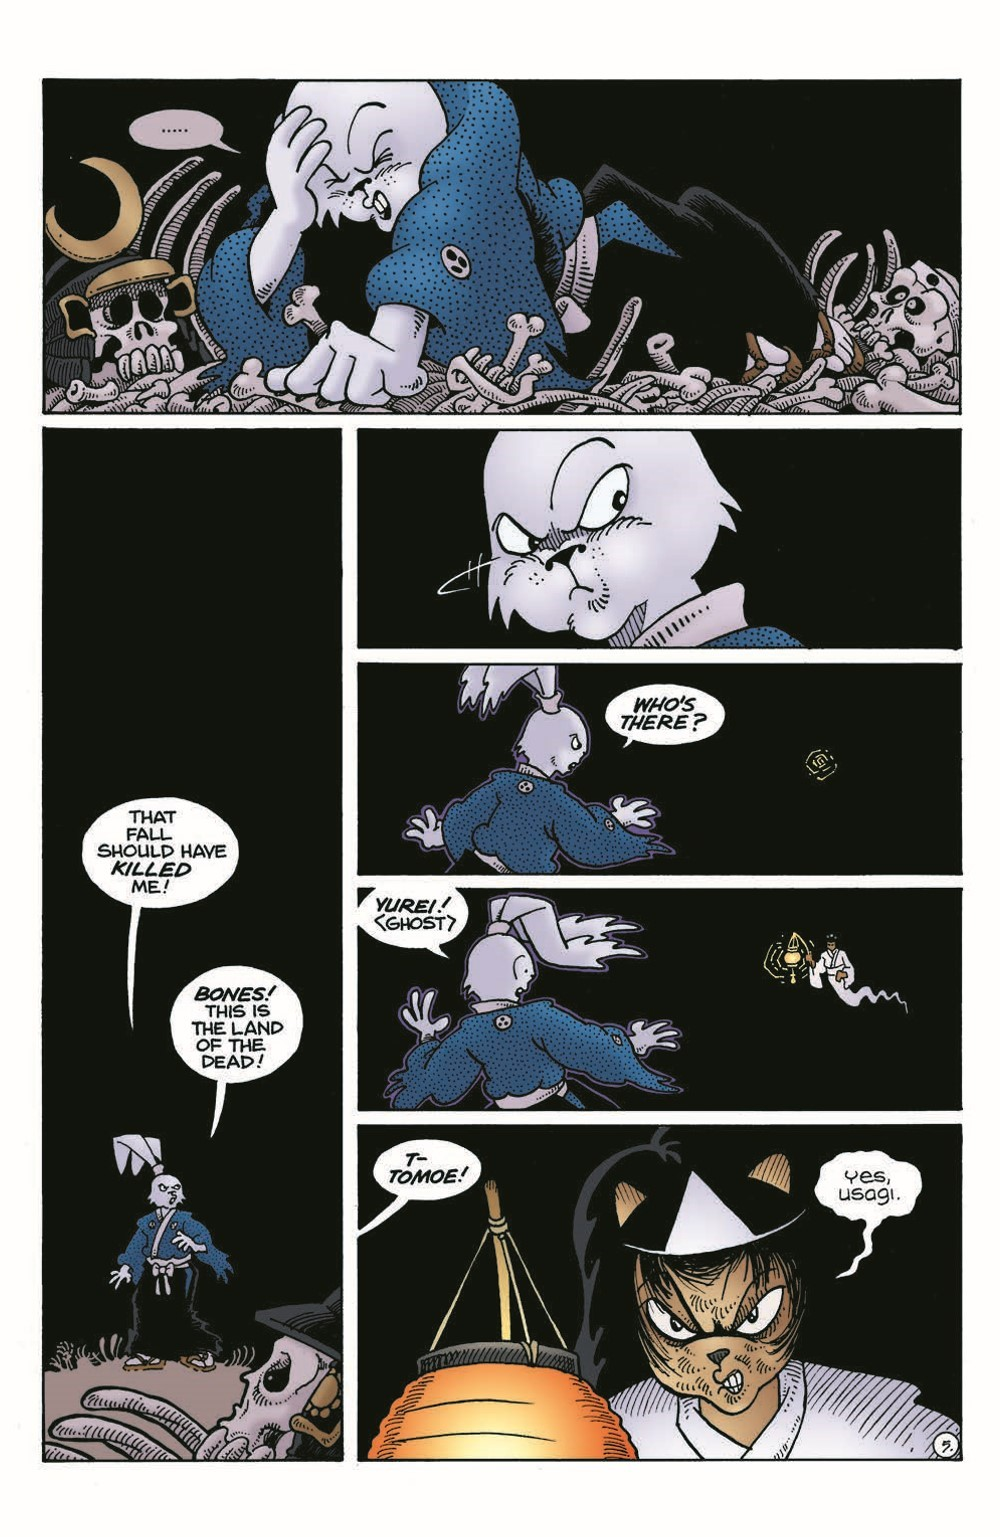 Usagi-DBC04_pr-7 ComicList Previews: USAGI YOJIMBO THE DRAGON BELLOW CONSPIRACY #4 (OF 6)